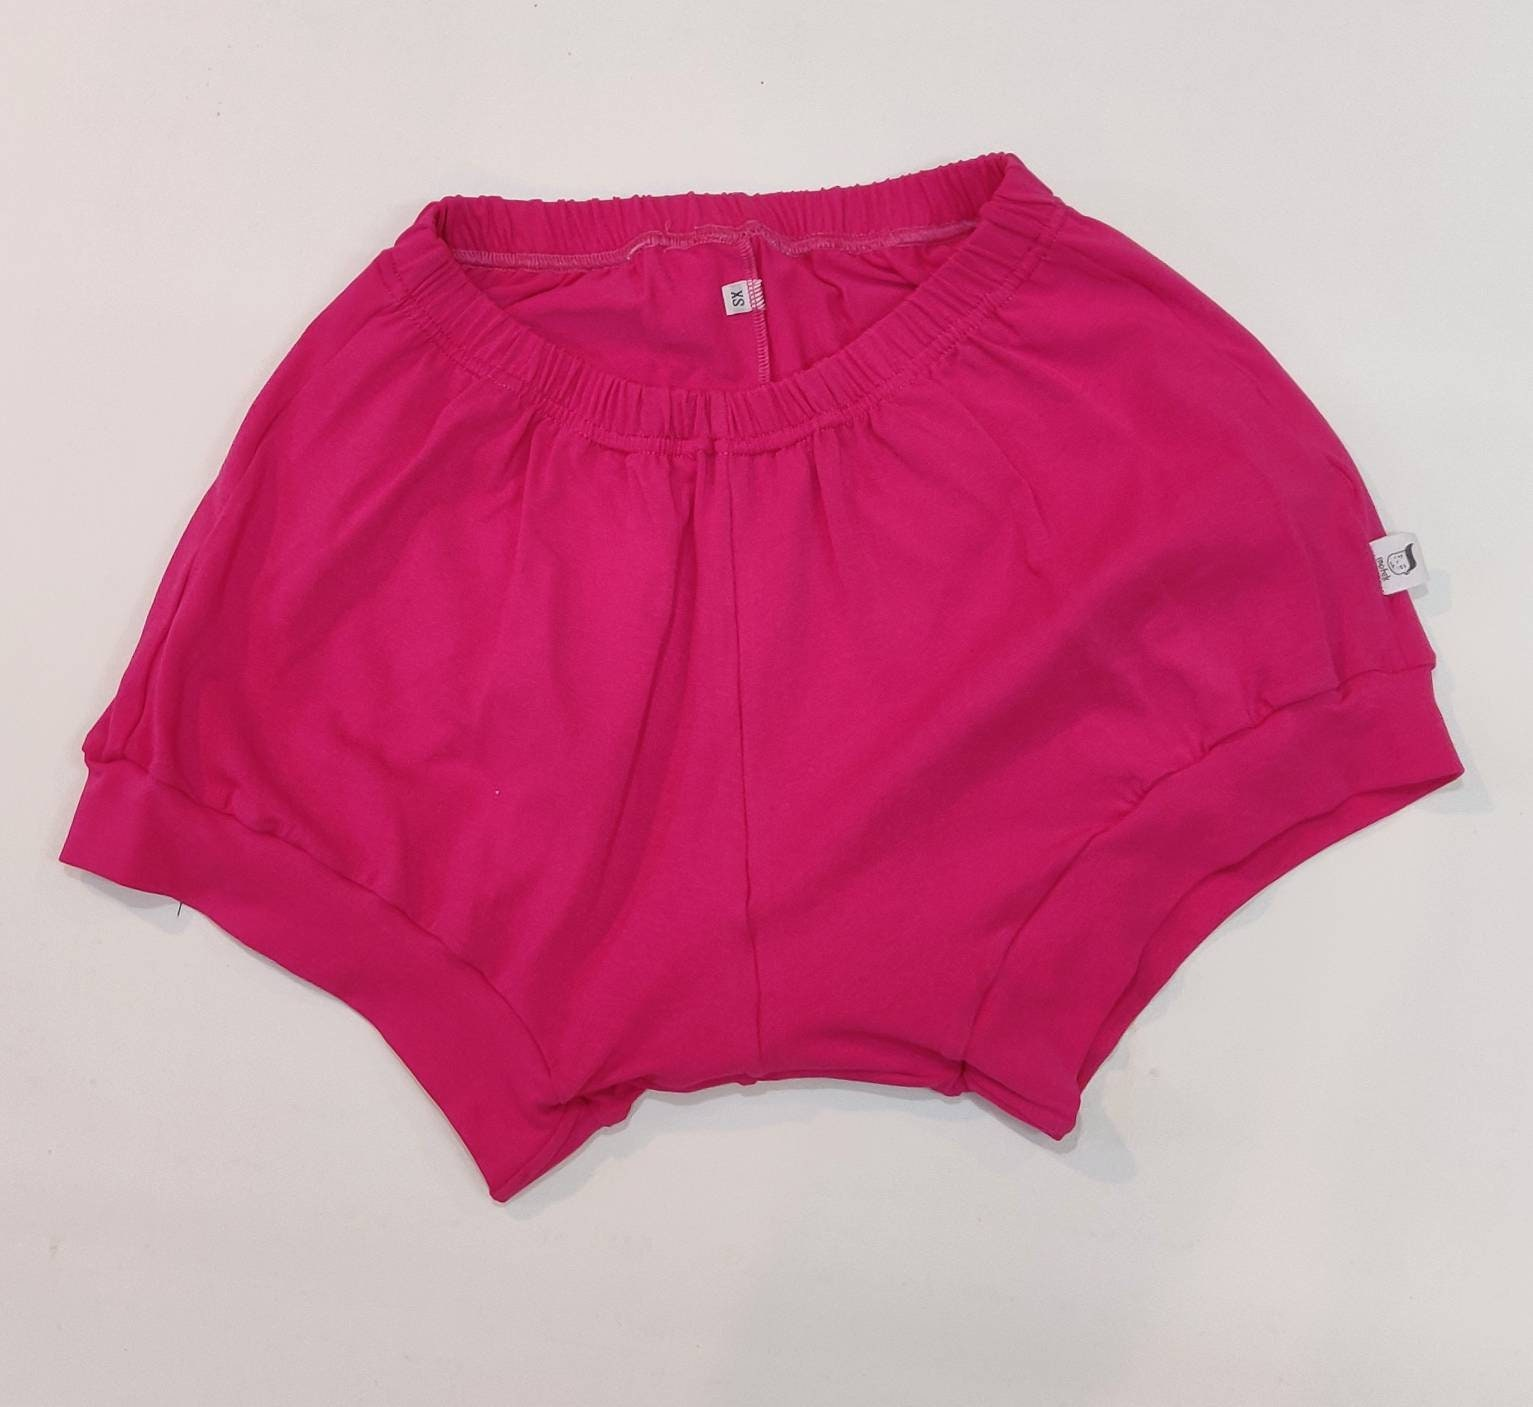 a7263f27c0b69 Iyengar Shorts, Hot Pink Yoga Pants, Yoga Gifts, Yoga Shorts, Pune Shorts,  Activewear, Yoga Clothing, Yoga Wear, Bloomers, Yoga Bloomers